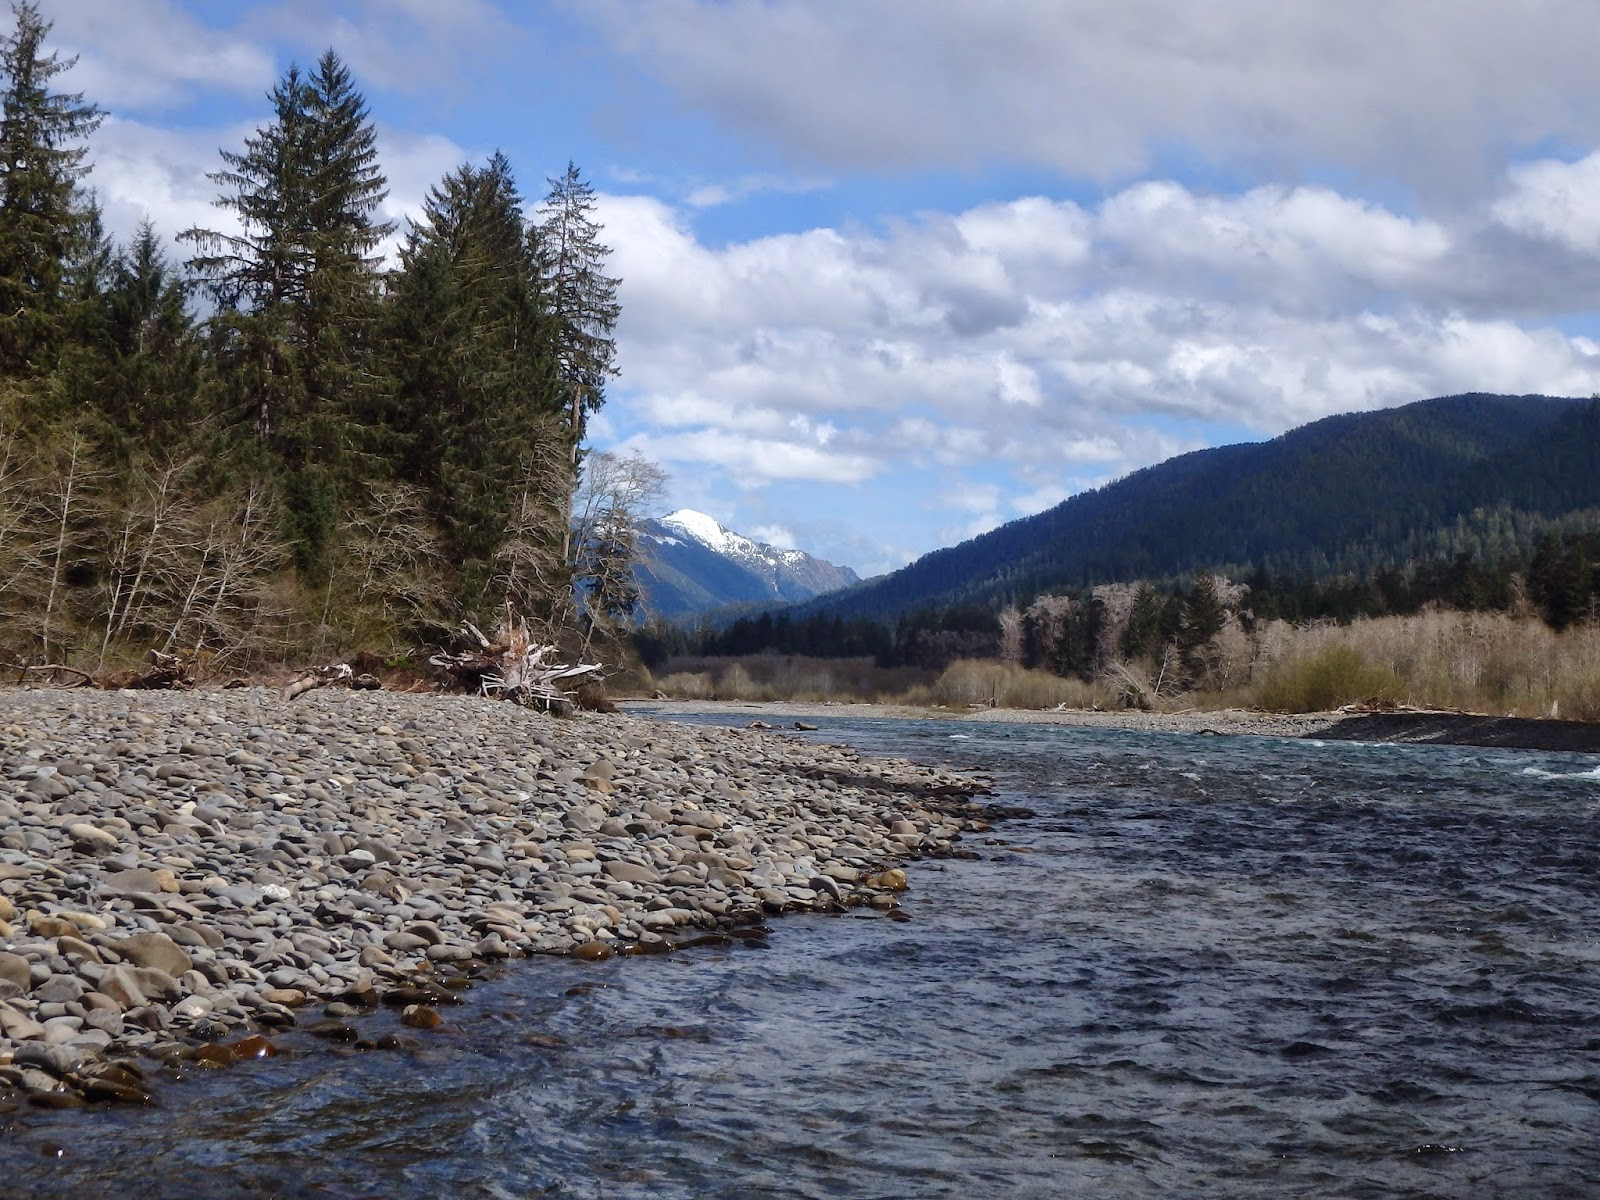 Bob humphrey fly fishing llc hoh river steelhead trip for Hoh river fishing